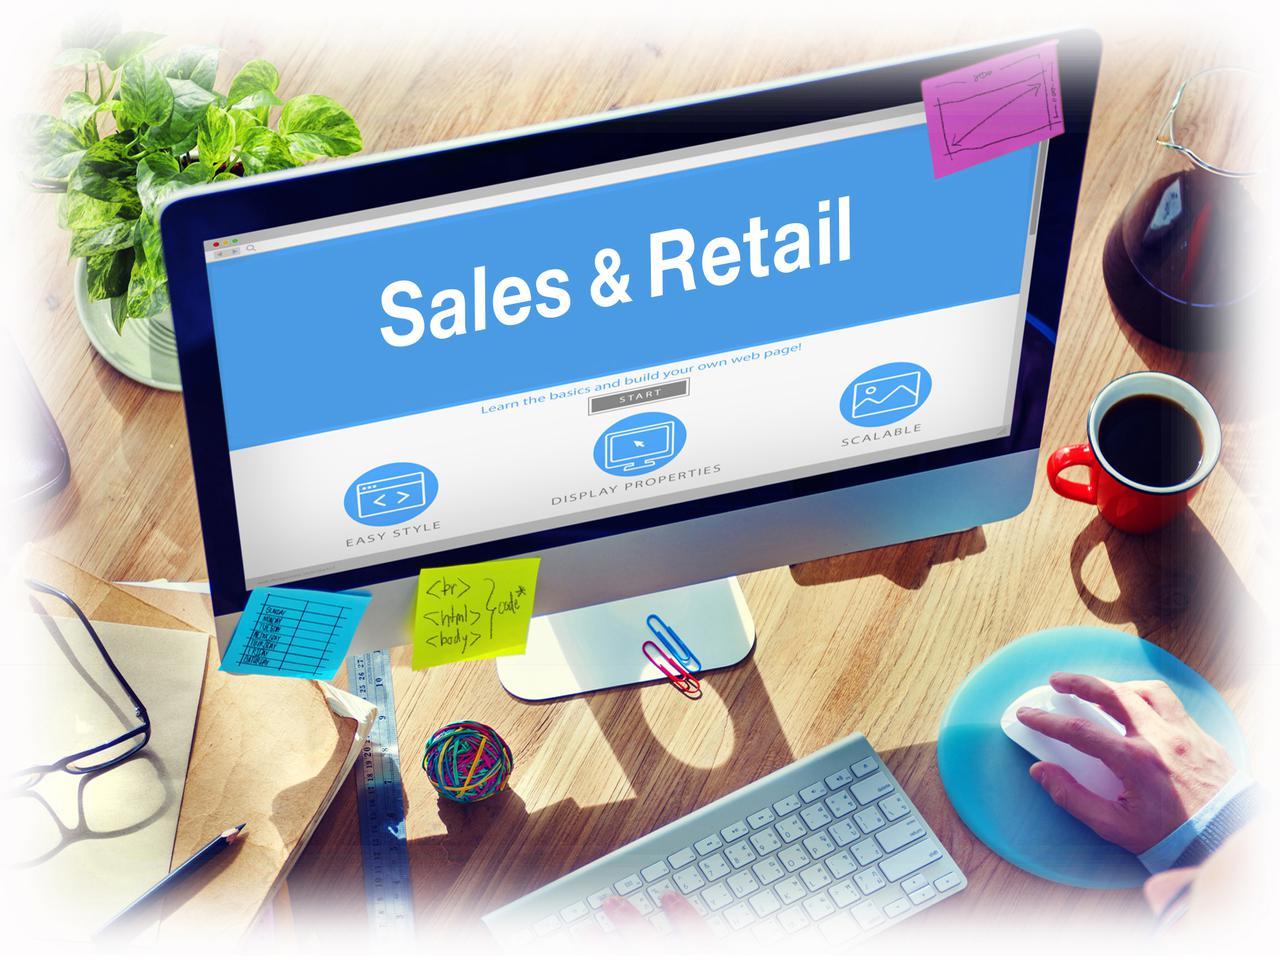 computer image - sales & retail.jpg